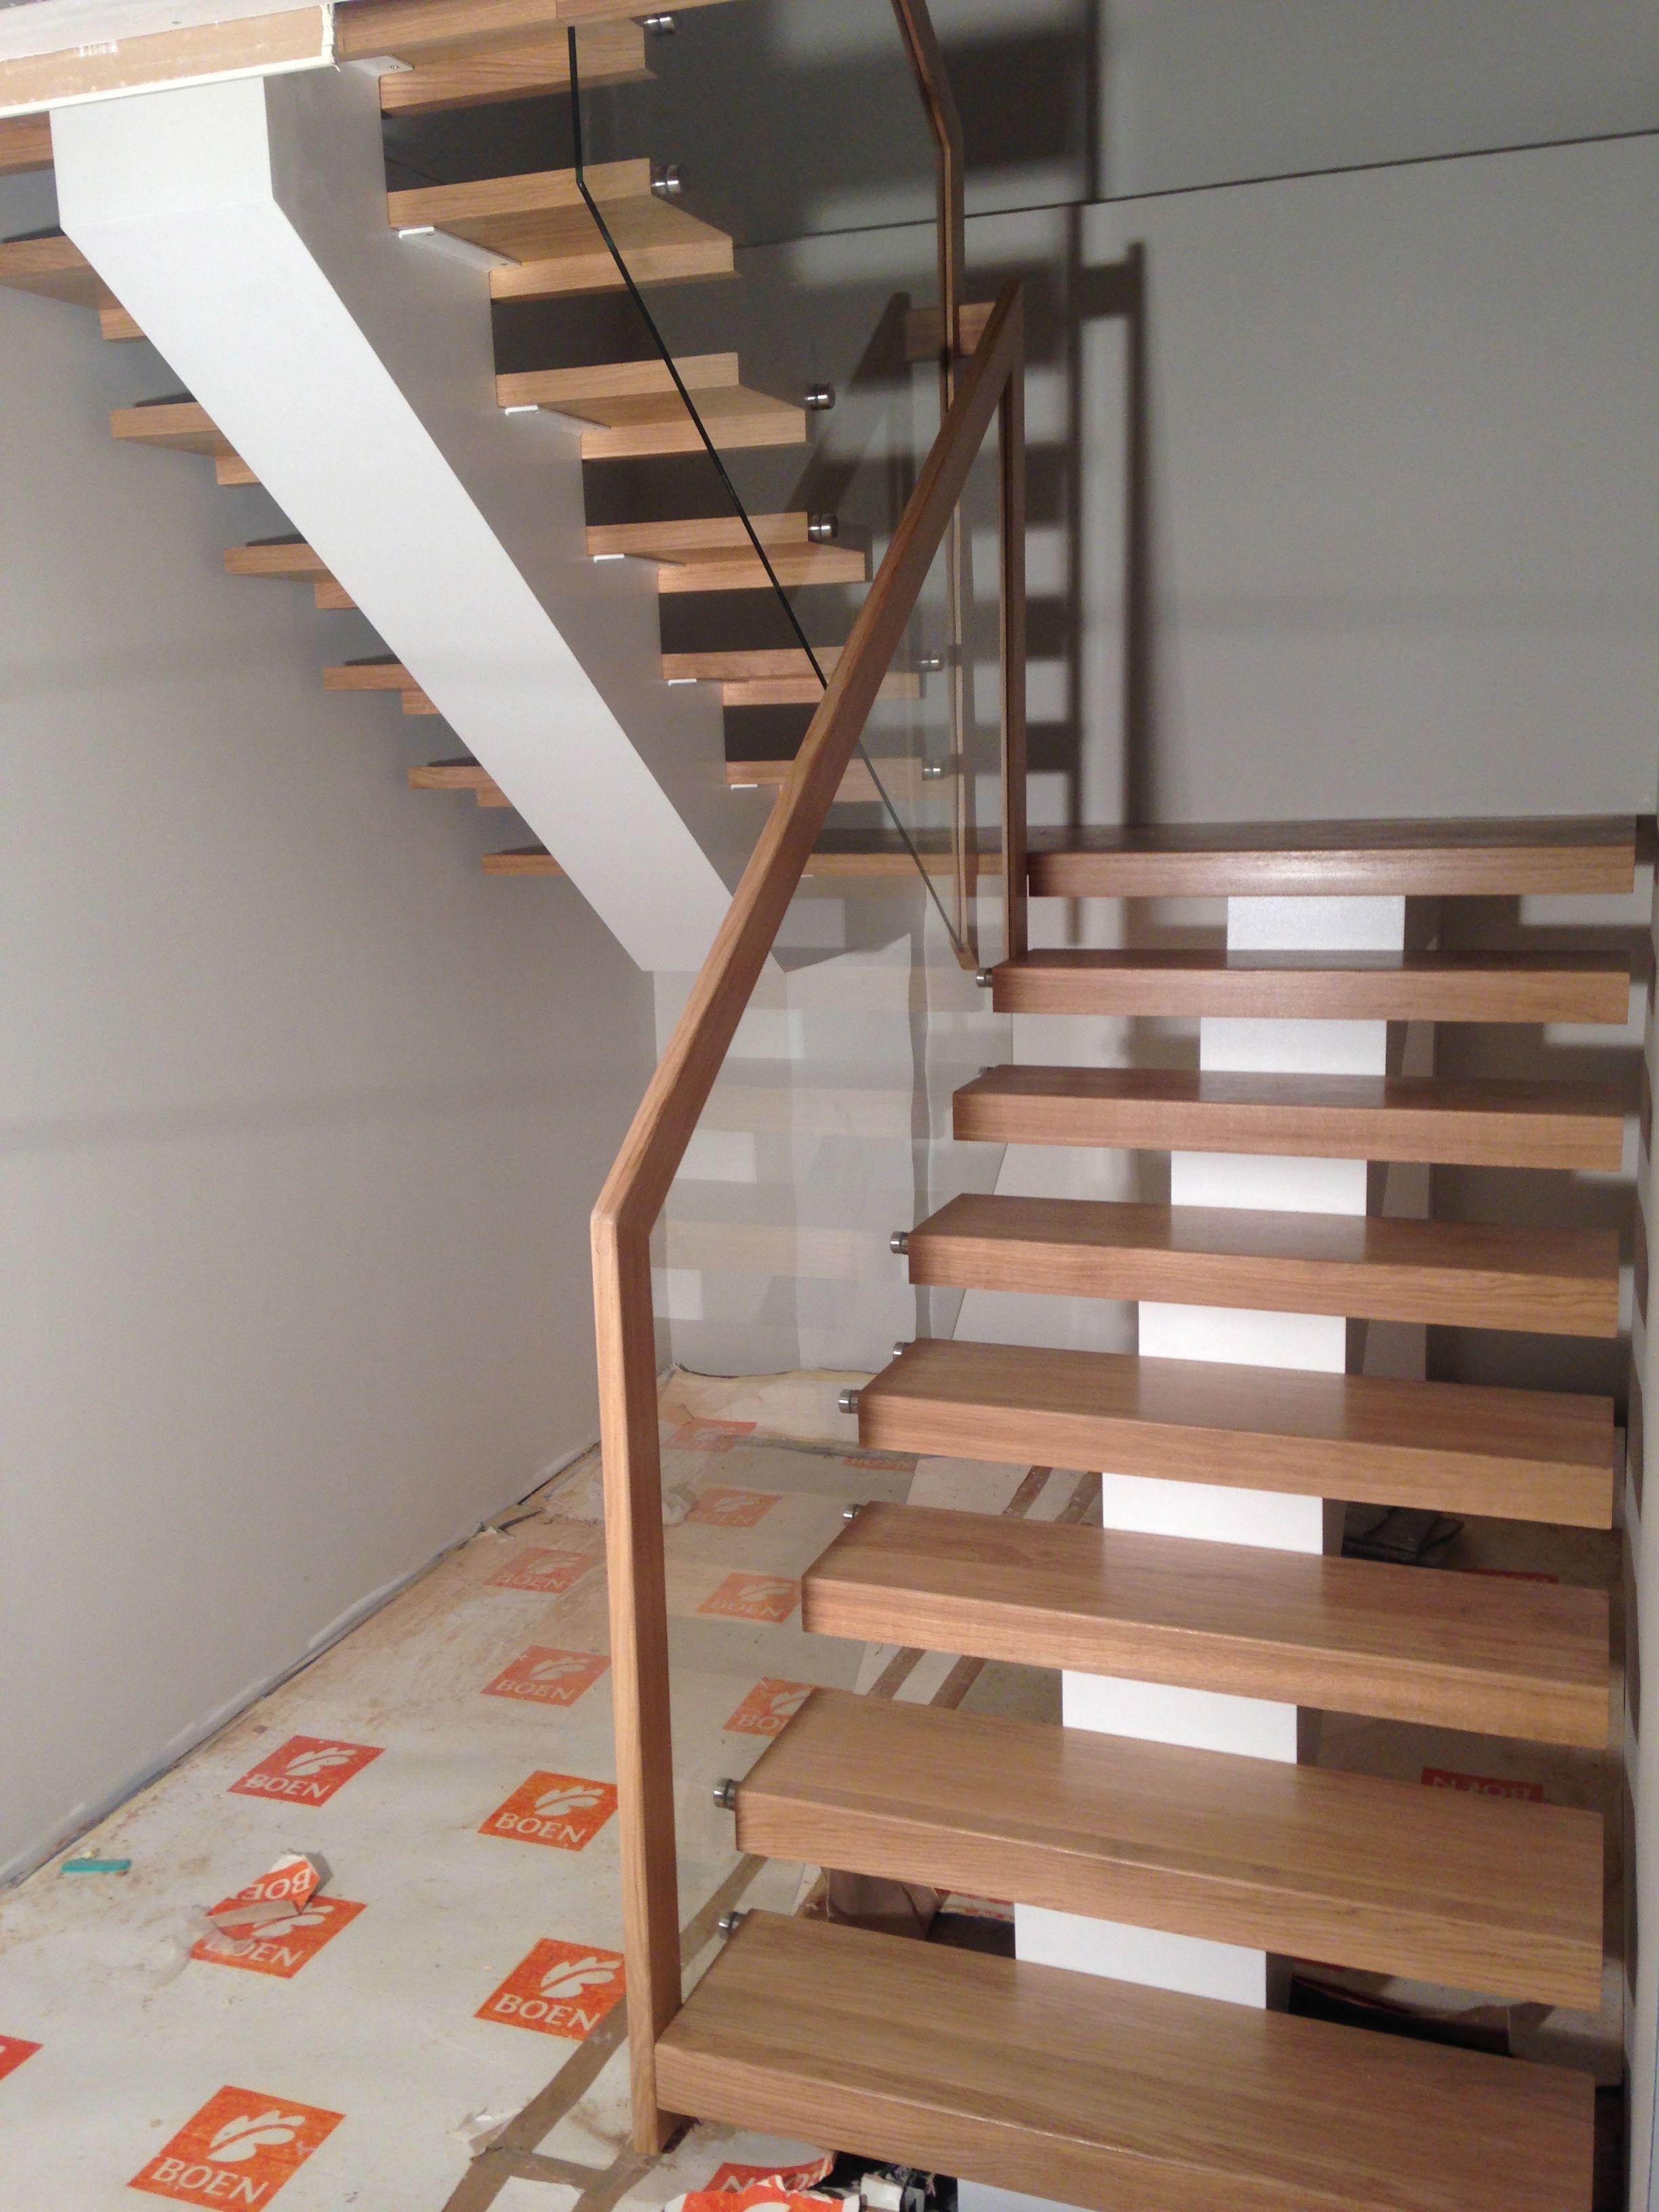 Steel Construction, Oak Wood Steps, Glass Railings